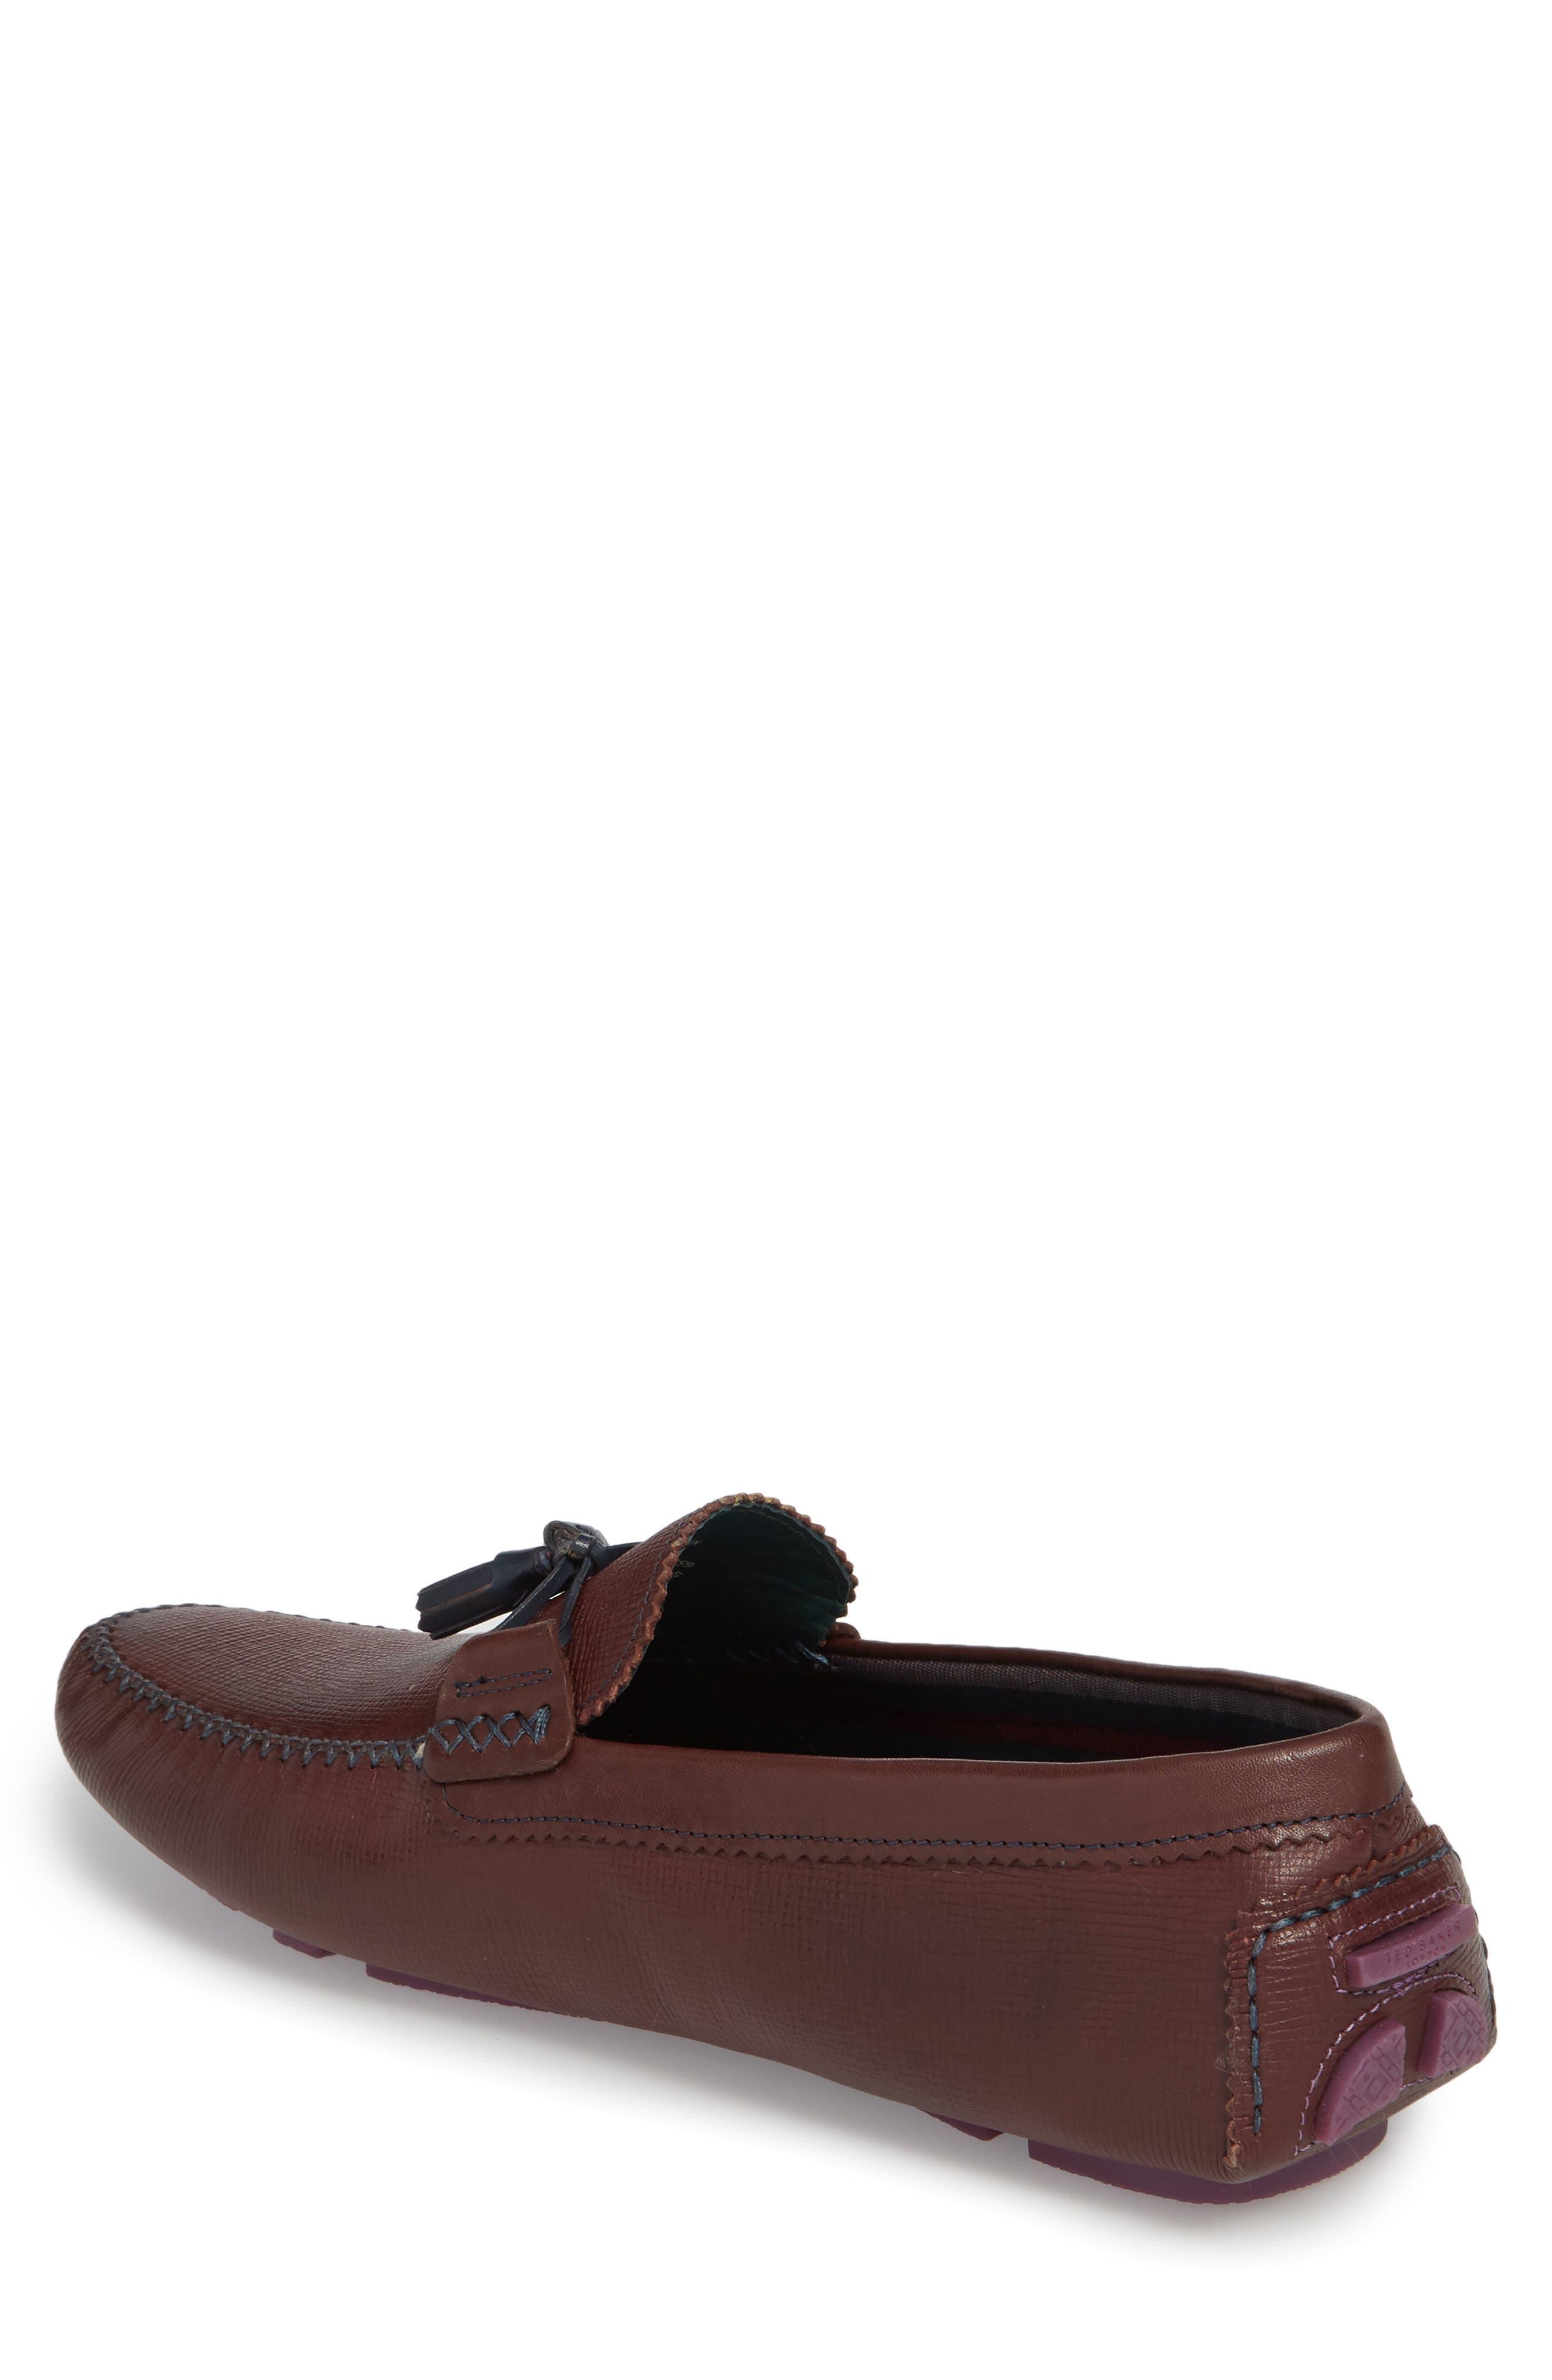 Urbonn Tasseled Driving Loafer,                             Alternate thumbnail 2, color,                             Dark Red Leather